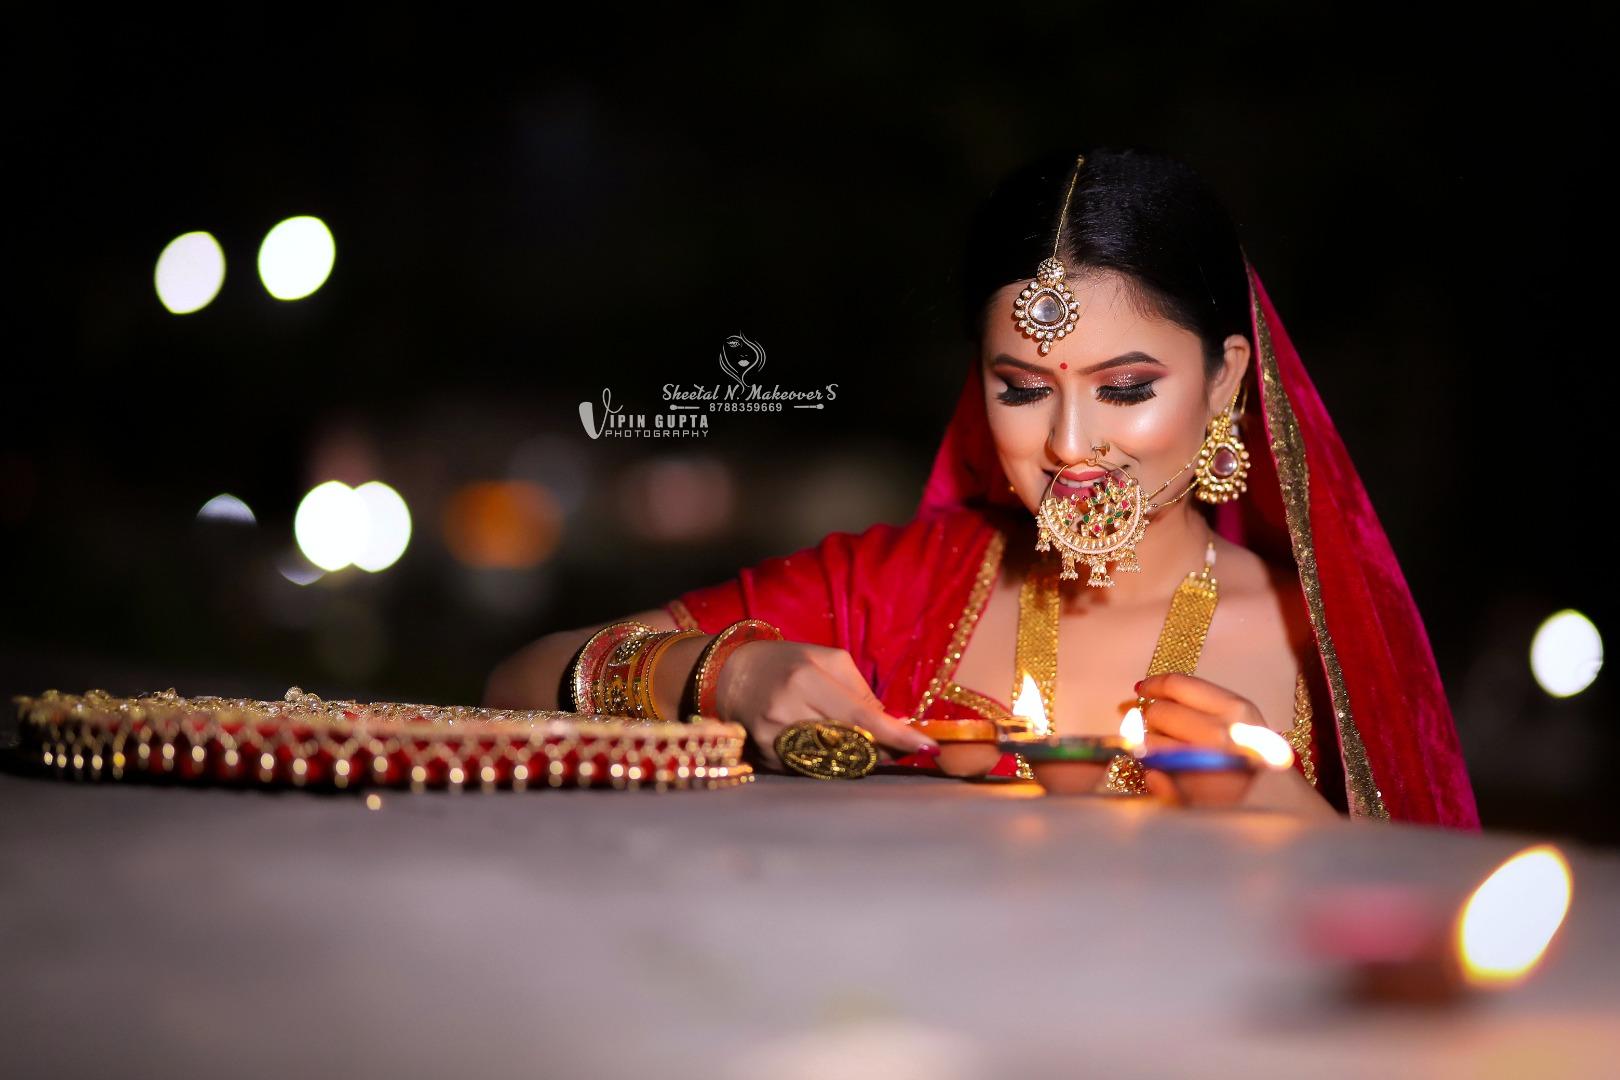 bride poses with a diya